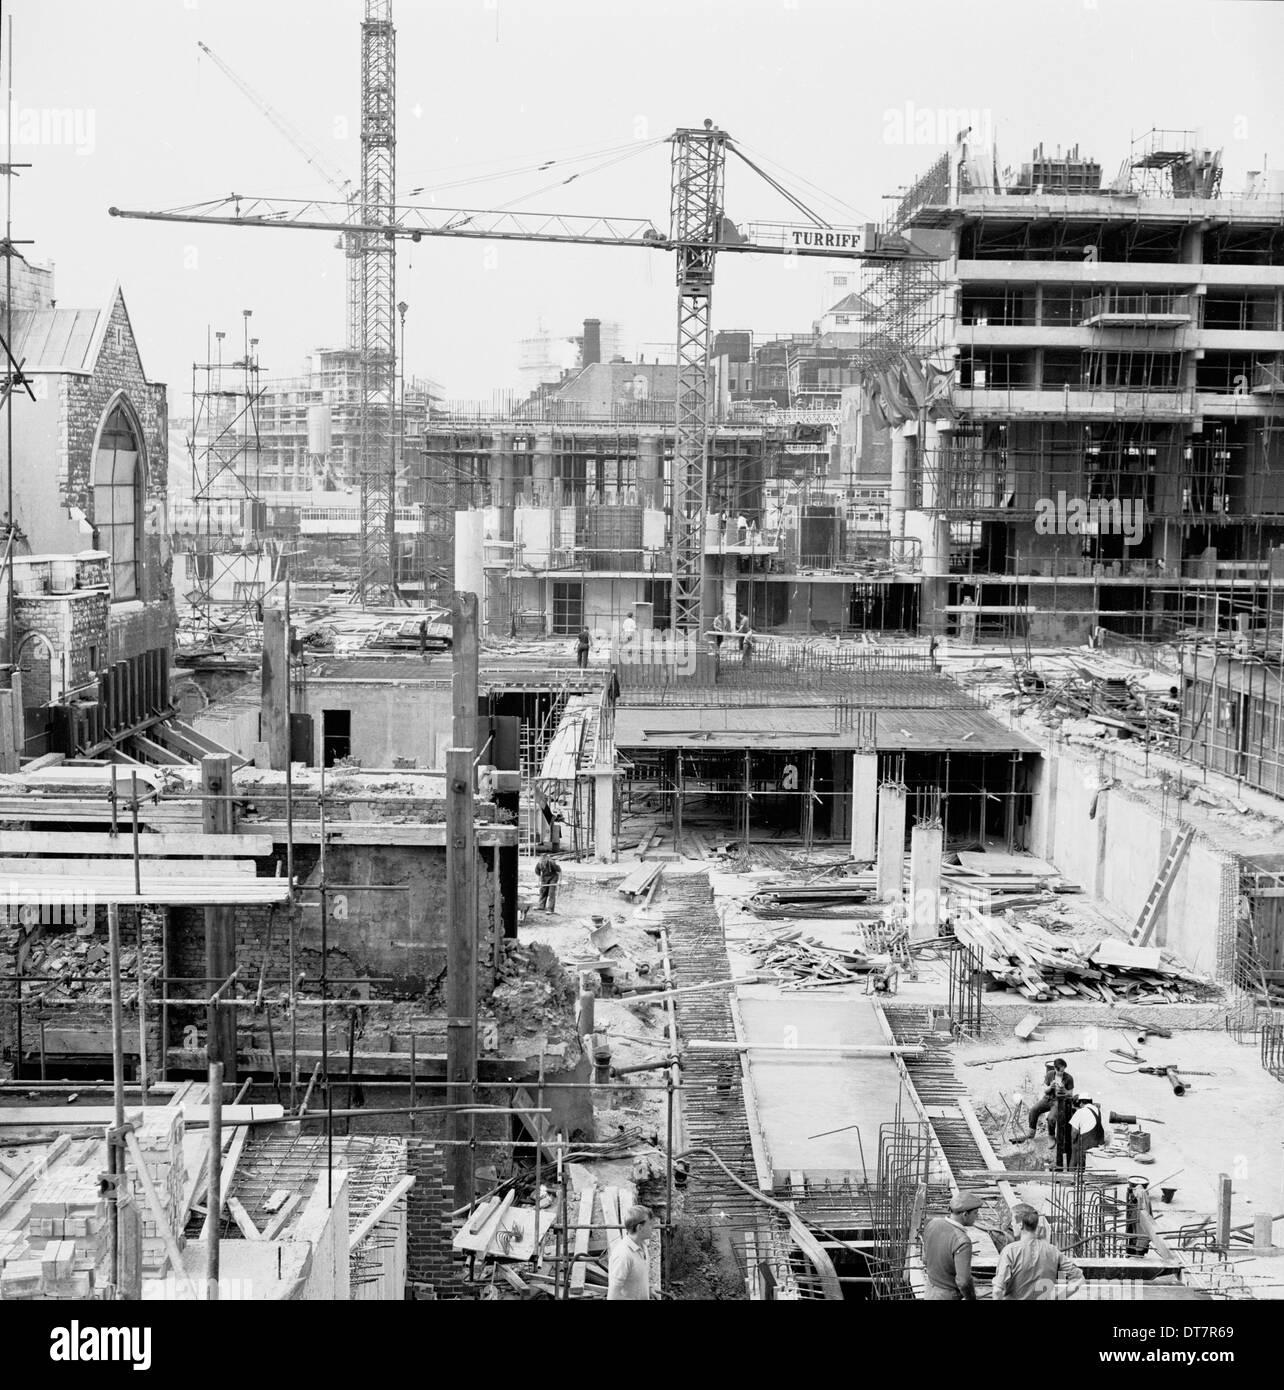 1950s, construction site, london. - Stock Image